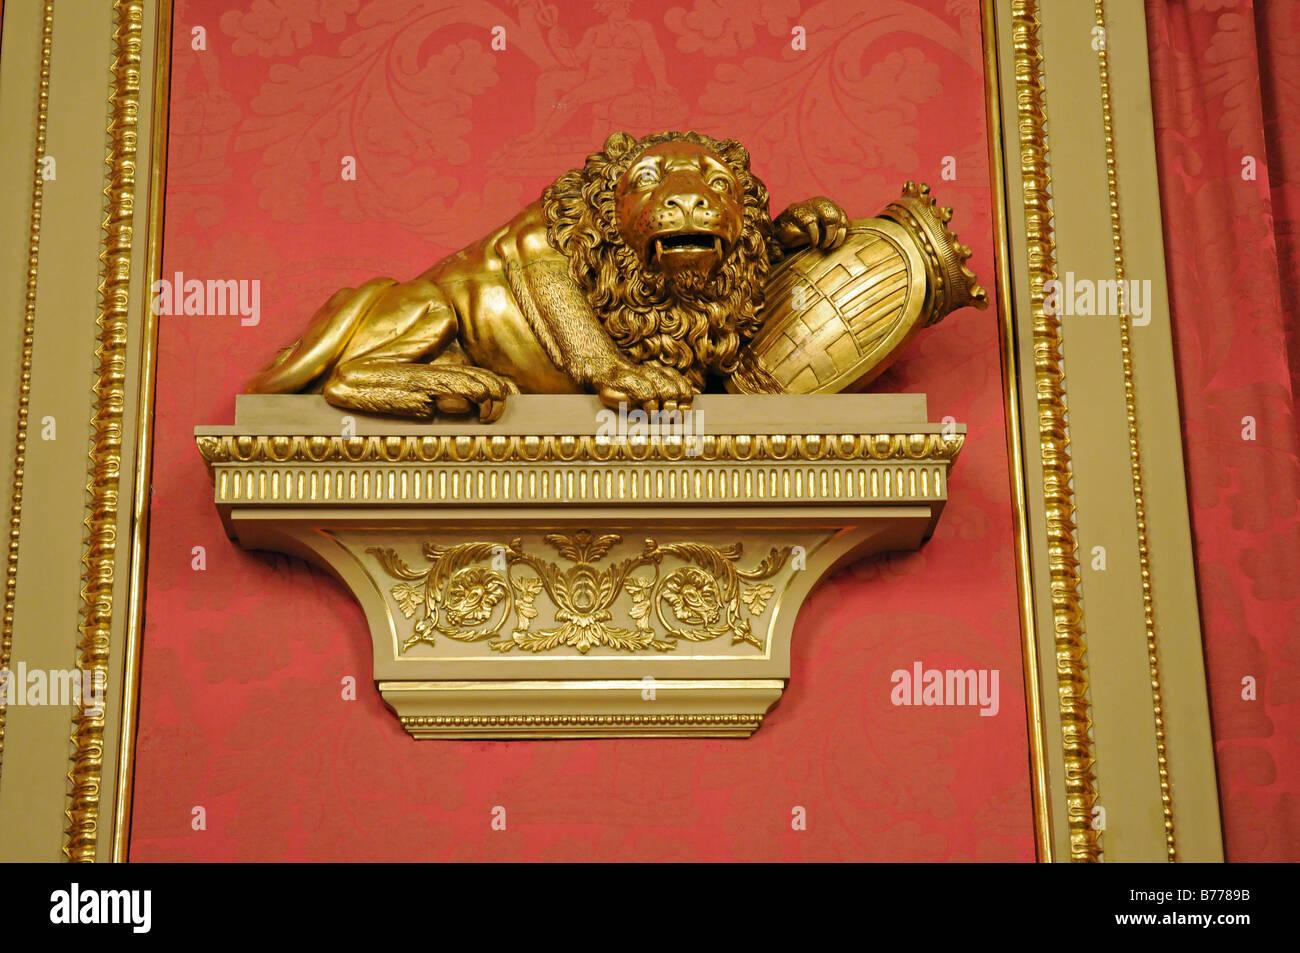 Lion statue, the Golden Parlour, hall, Palacio de la Llotja de Mar, former stock exchange, Barcelona, Catalonia, Stock Photo